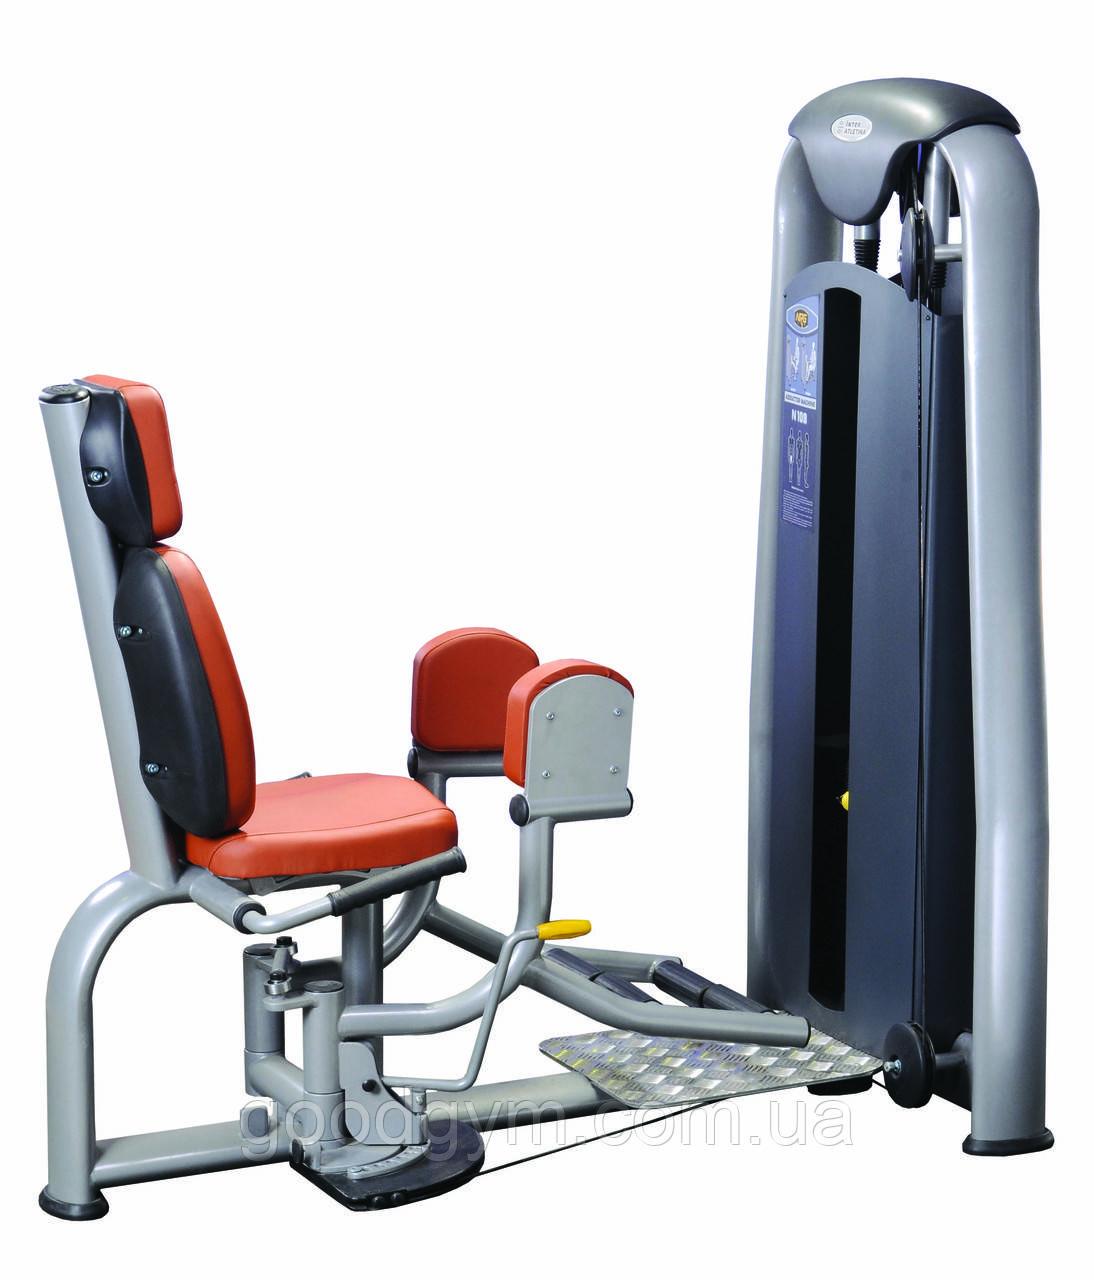 Тренажер для отводящих мышц бедра NRG N108